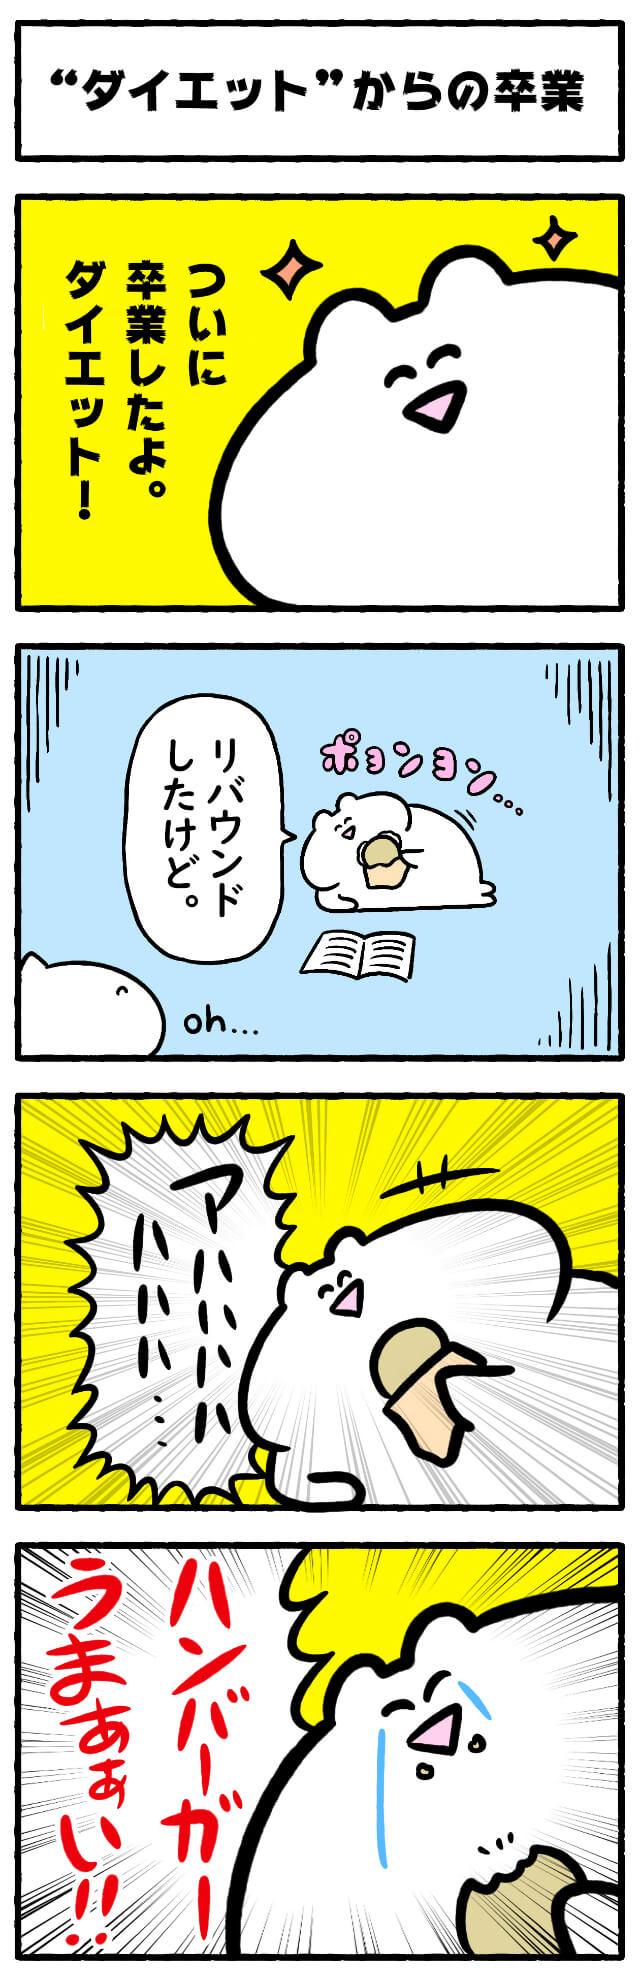 STUDY優作 卒業 ダイエット 四コマ漫画